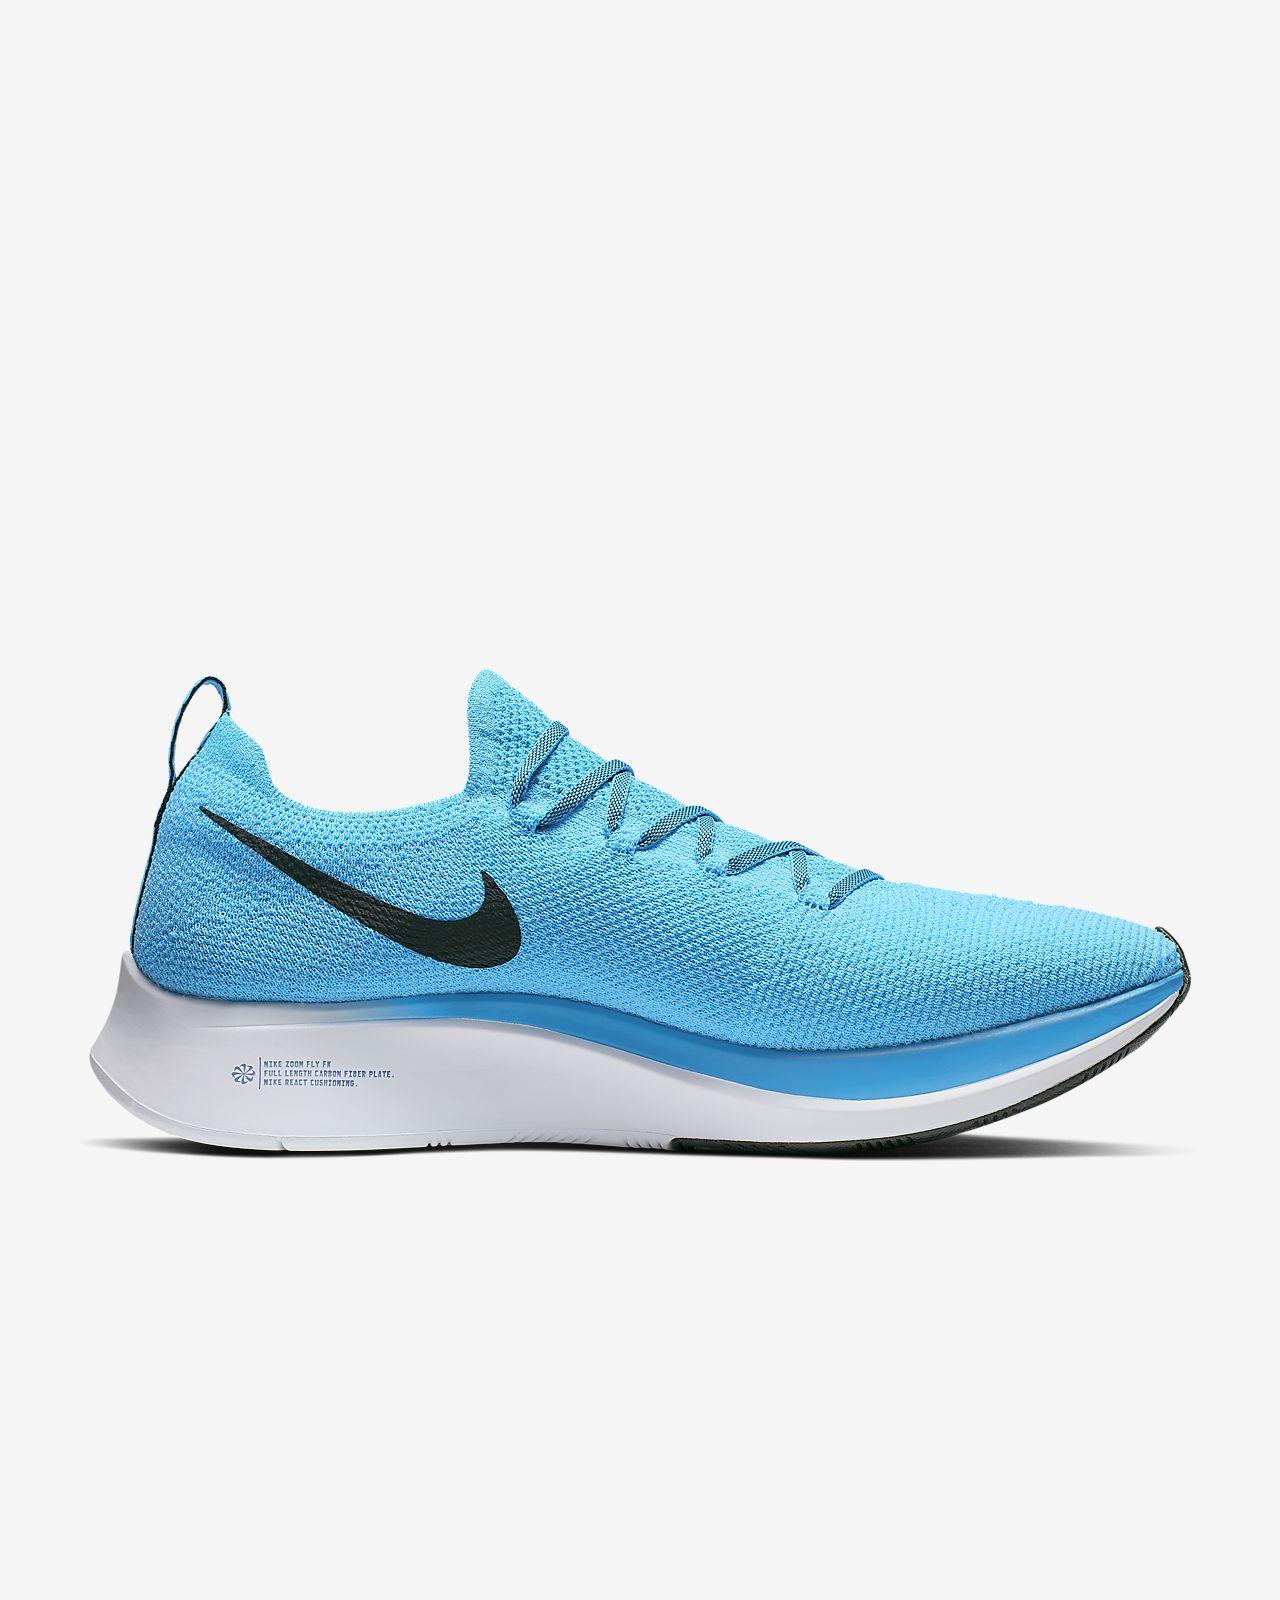 reputable site 7f847 50b5e ... Nike Zoom Fly Flyknit-løbesko til mænd